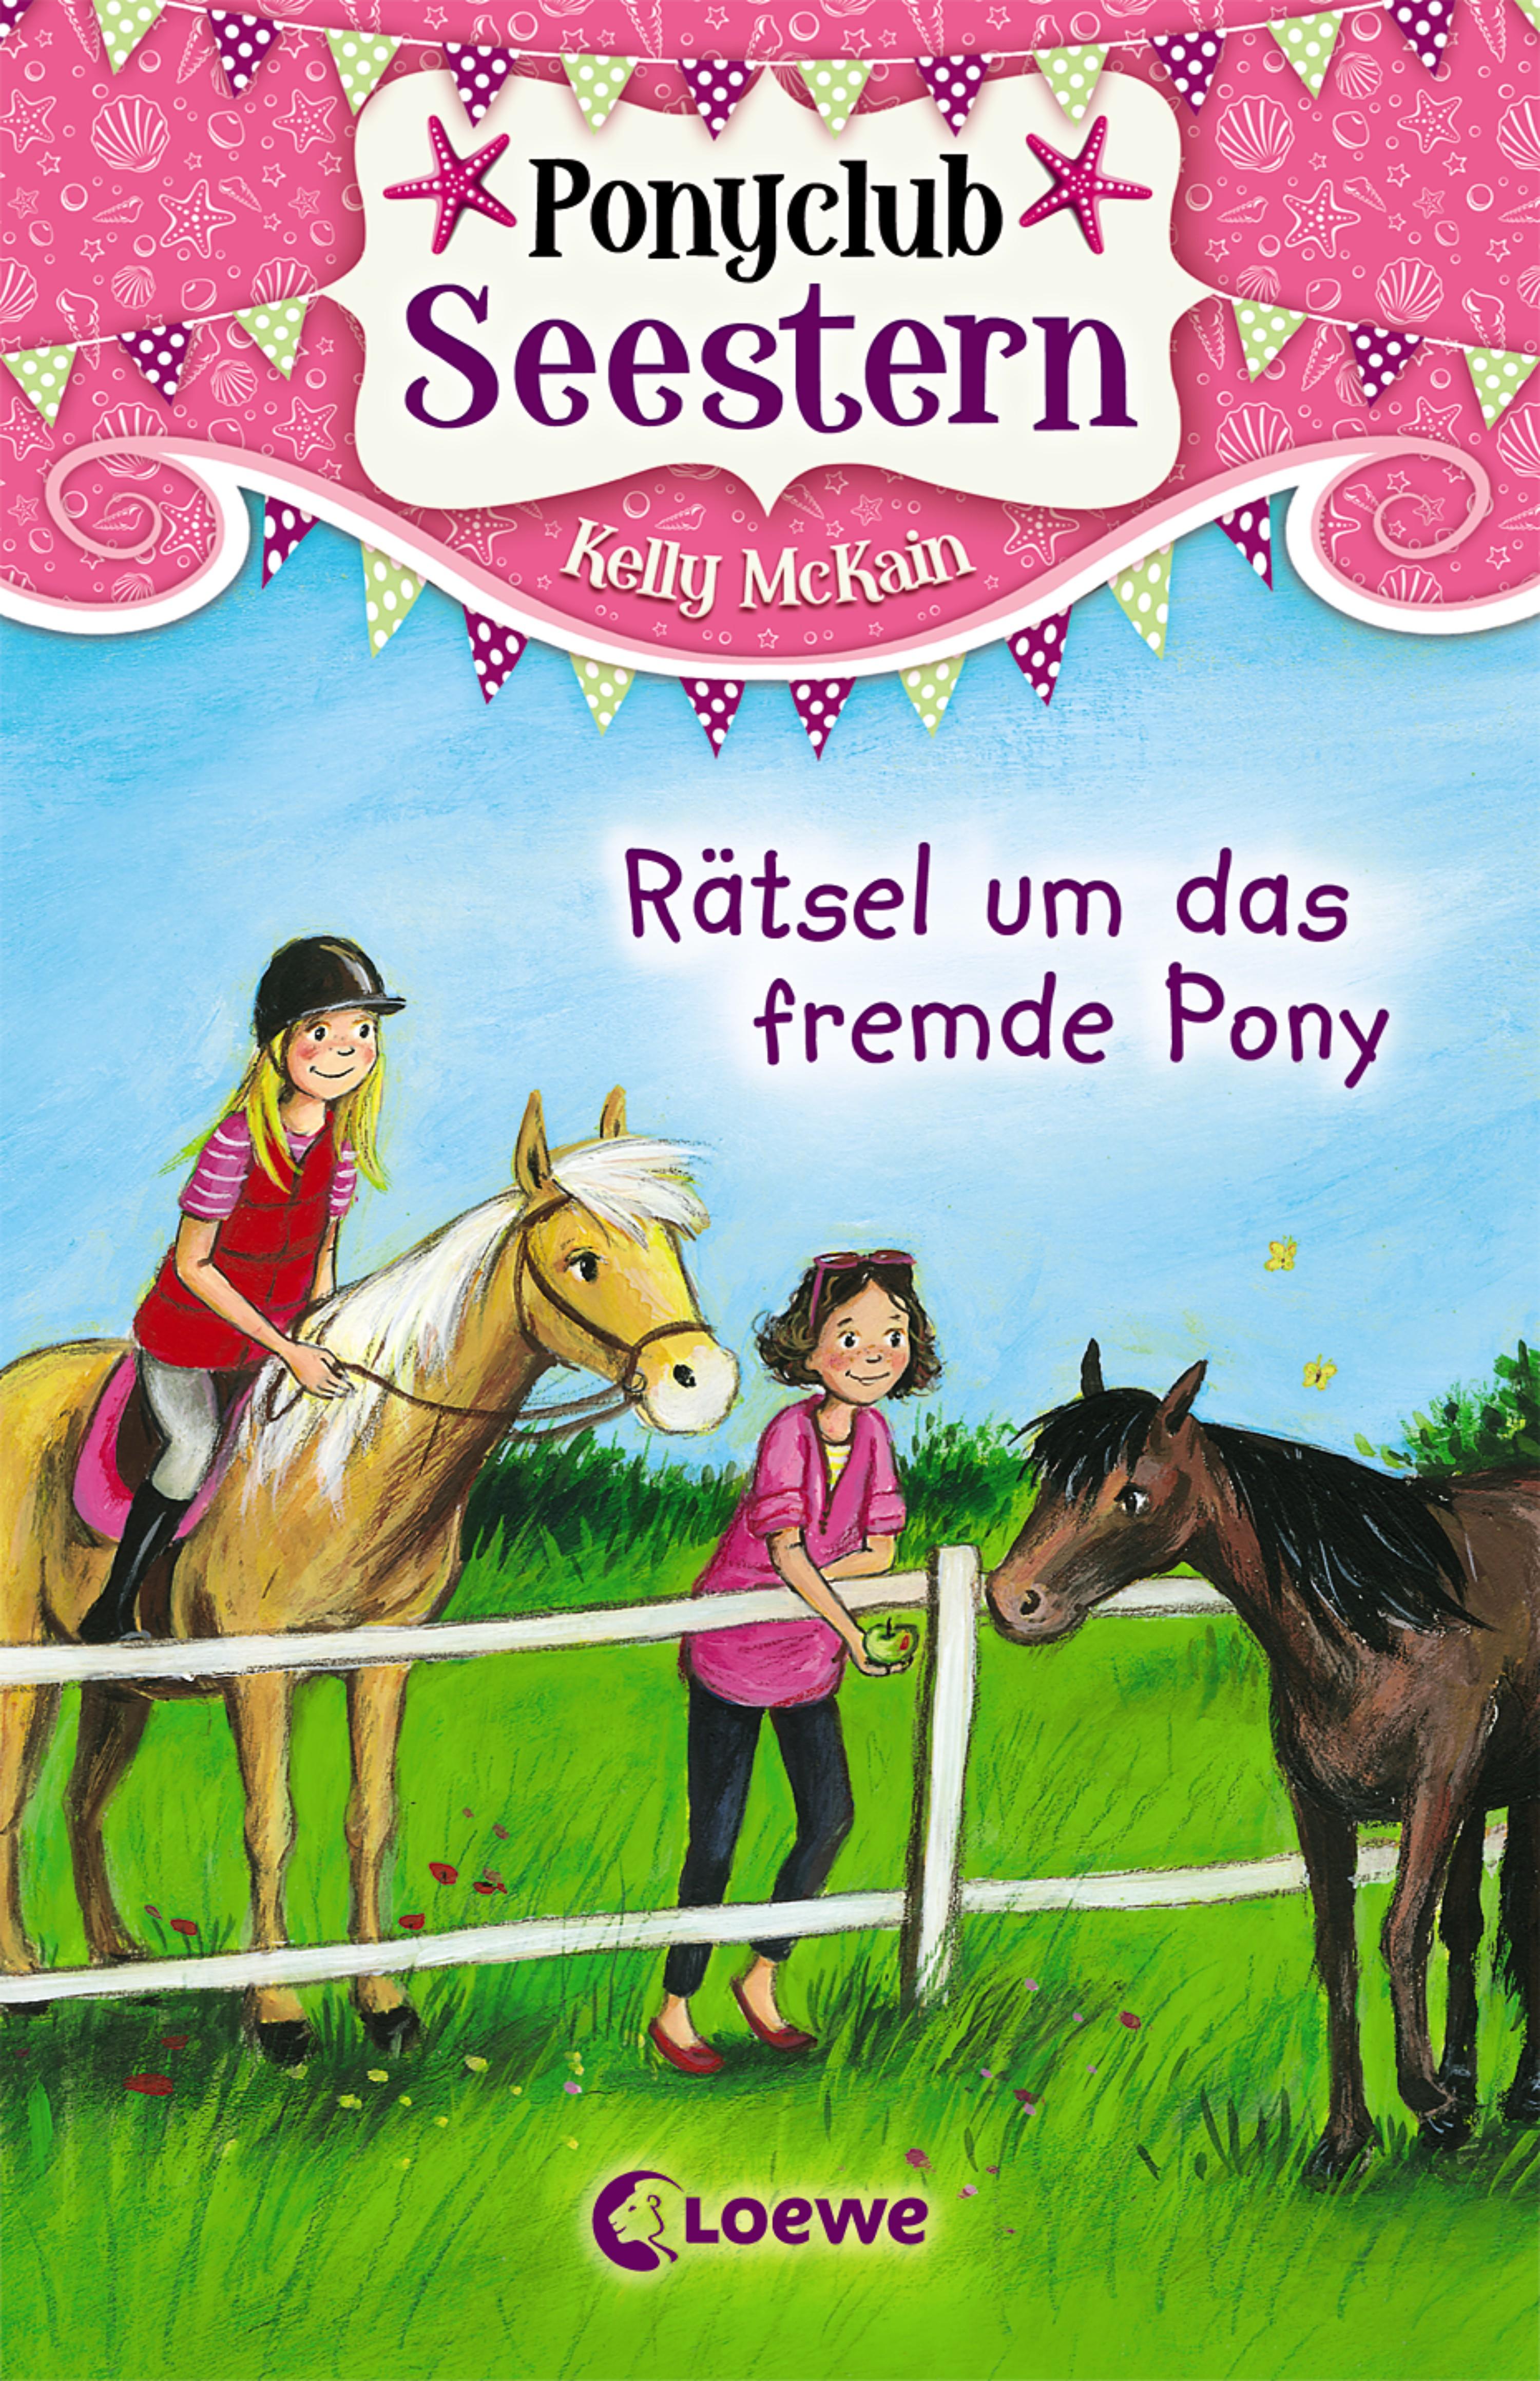 Kelly McKain Ponyclub Seestern 3 - Rätsel um das fremde Pony